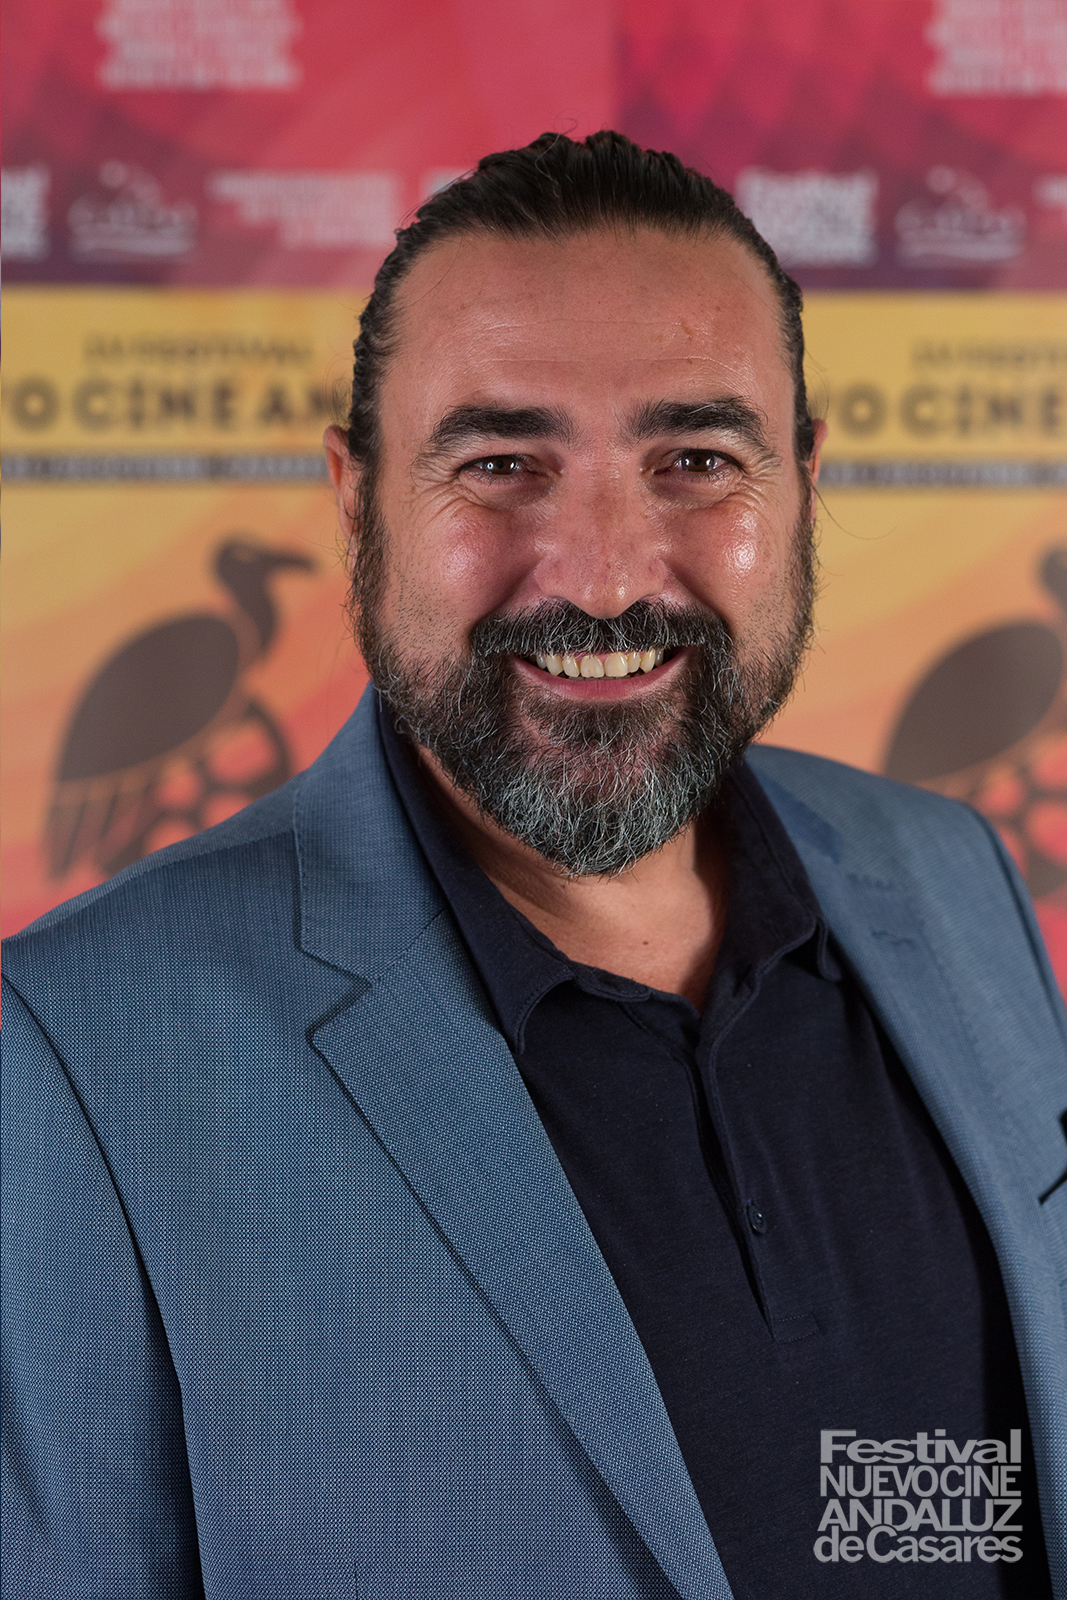 Jaime D. Triviño